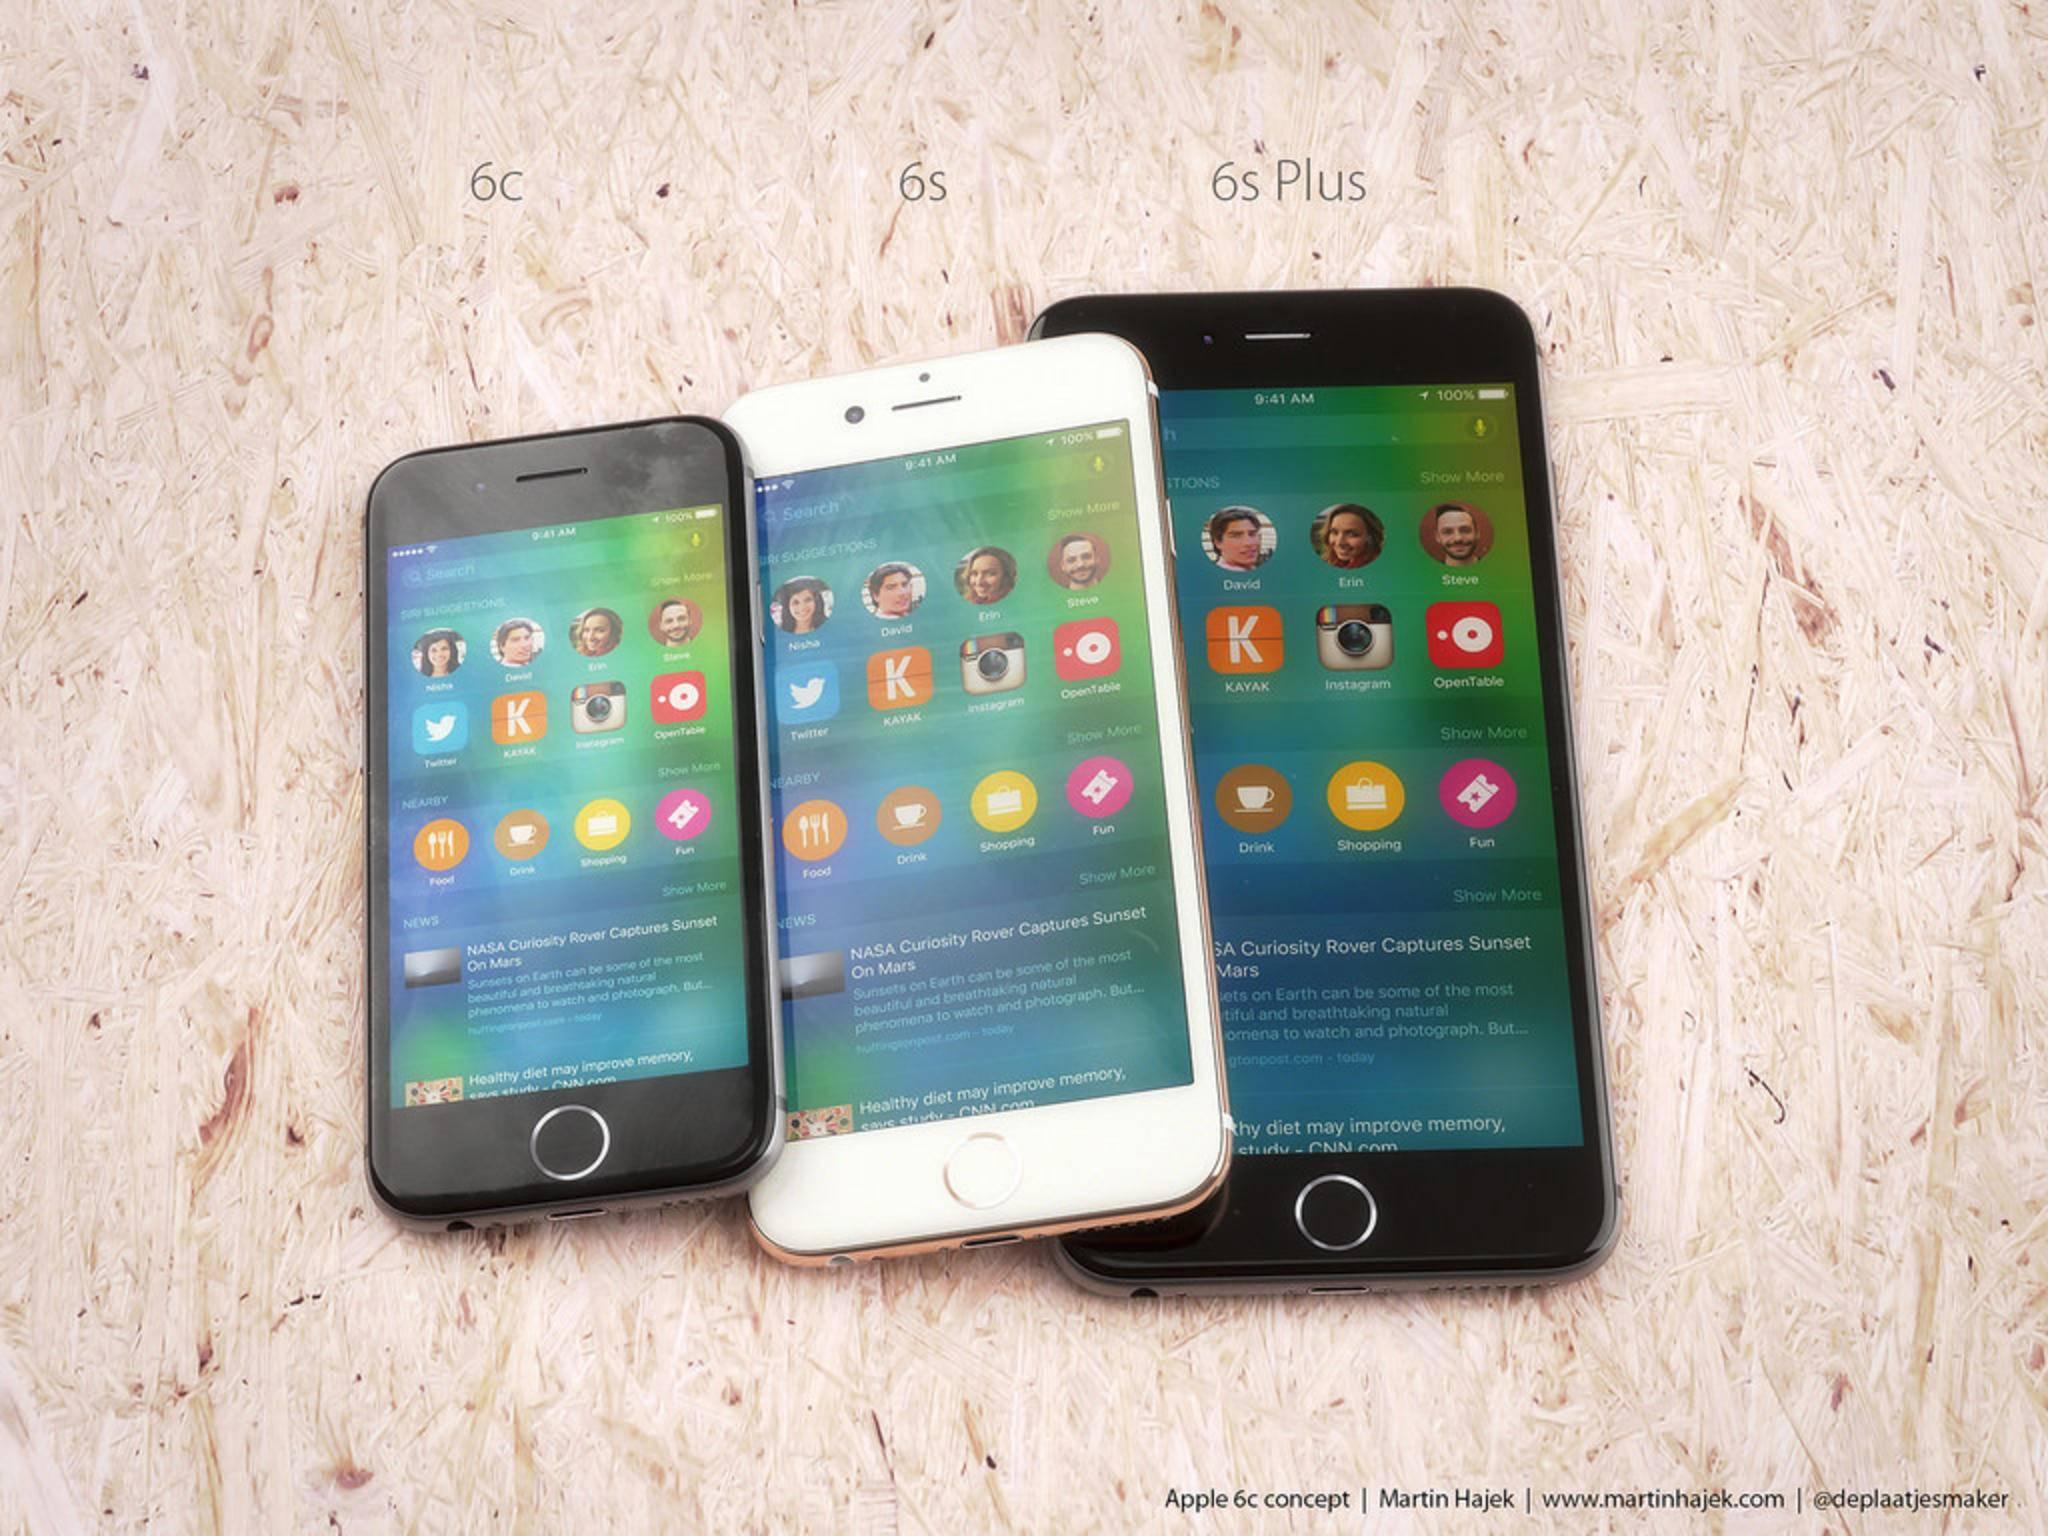 Das iPhone 6c soll bereits im Februar erscheinen.